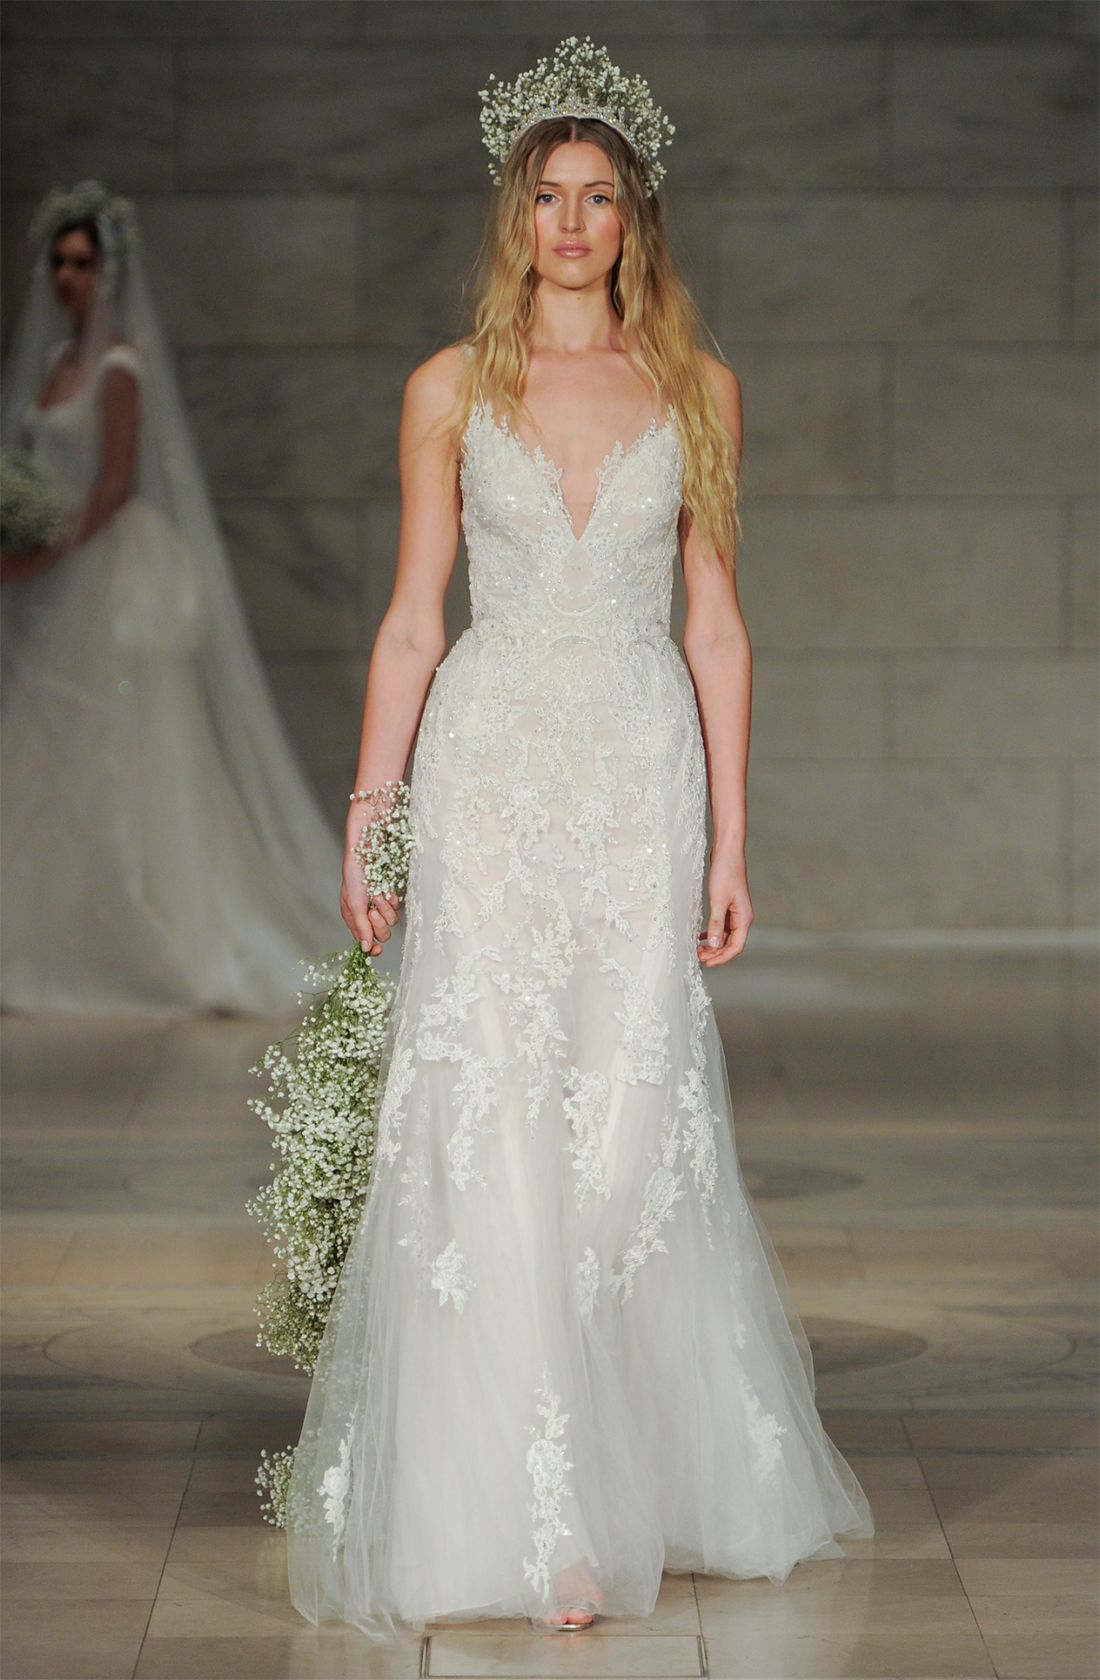 Houston Wedding Planners Professionals Weddings In Houston Weddings In Houston Reem Acra Bridal Dream Wedding Dress Princesses Ball Gown Wedding Dress